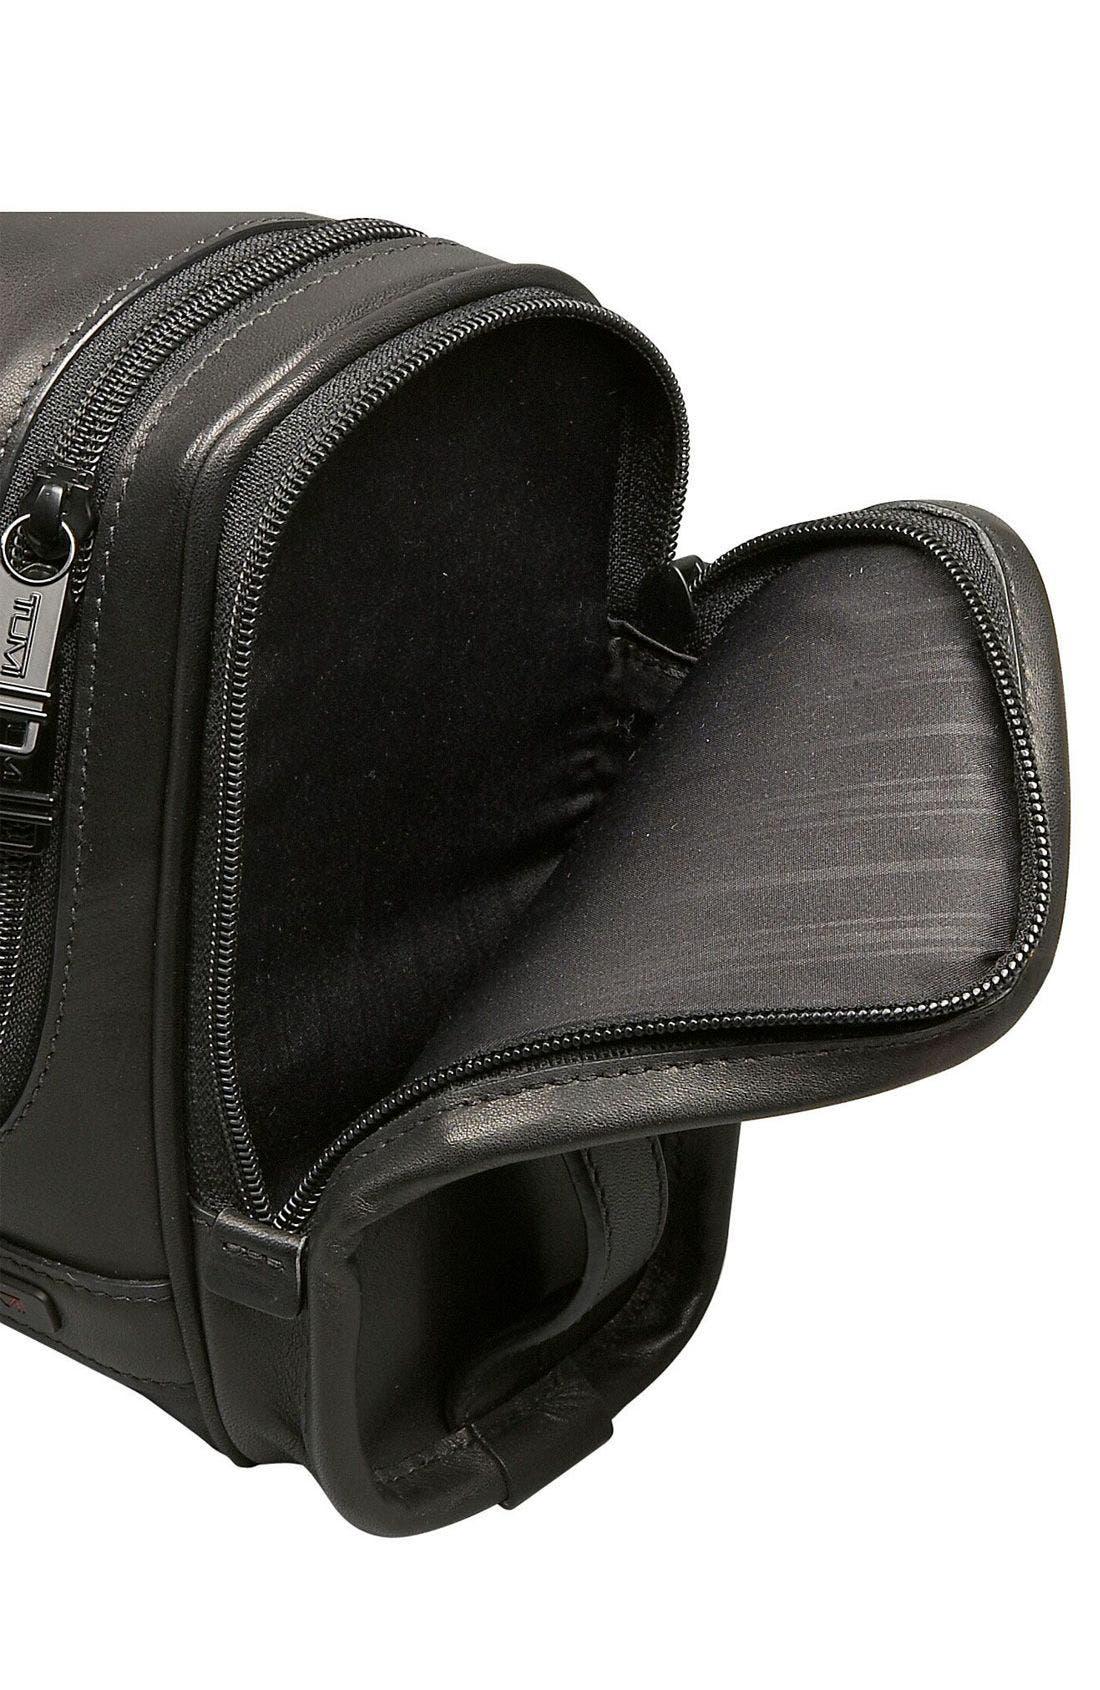 Alternate Image 3  - Tumi 'Alpha' Hanging Leather Travel Kit